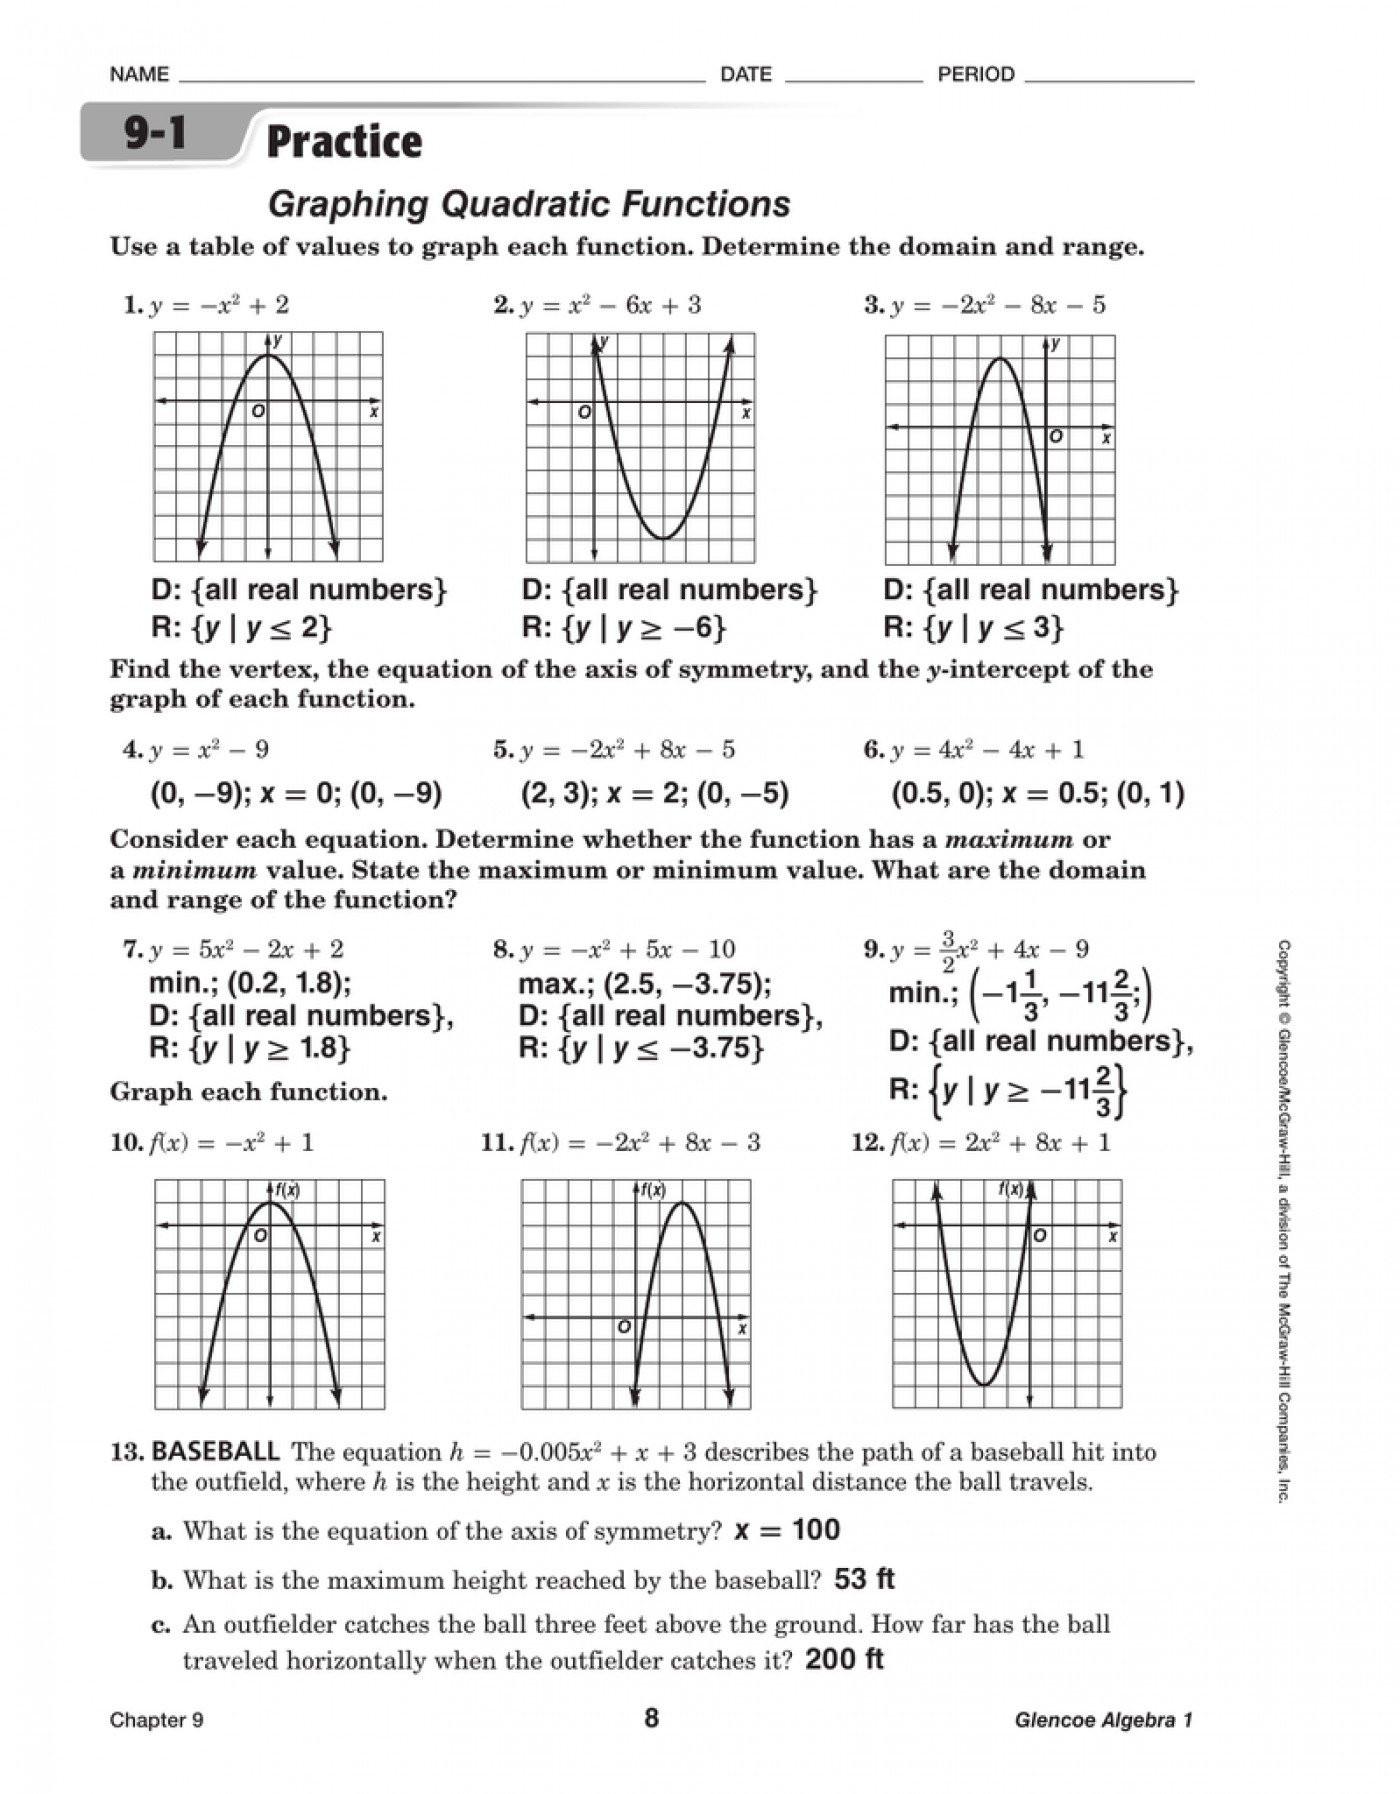 Graphing Quadratic Functions Worksheet Worksheet Graphing Quadratic Functions A 3 2 Answers